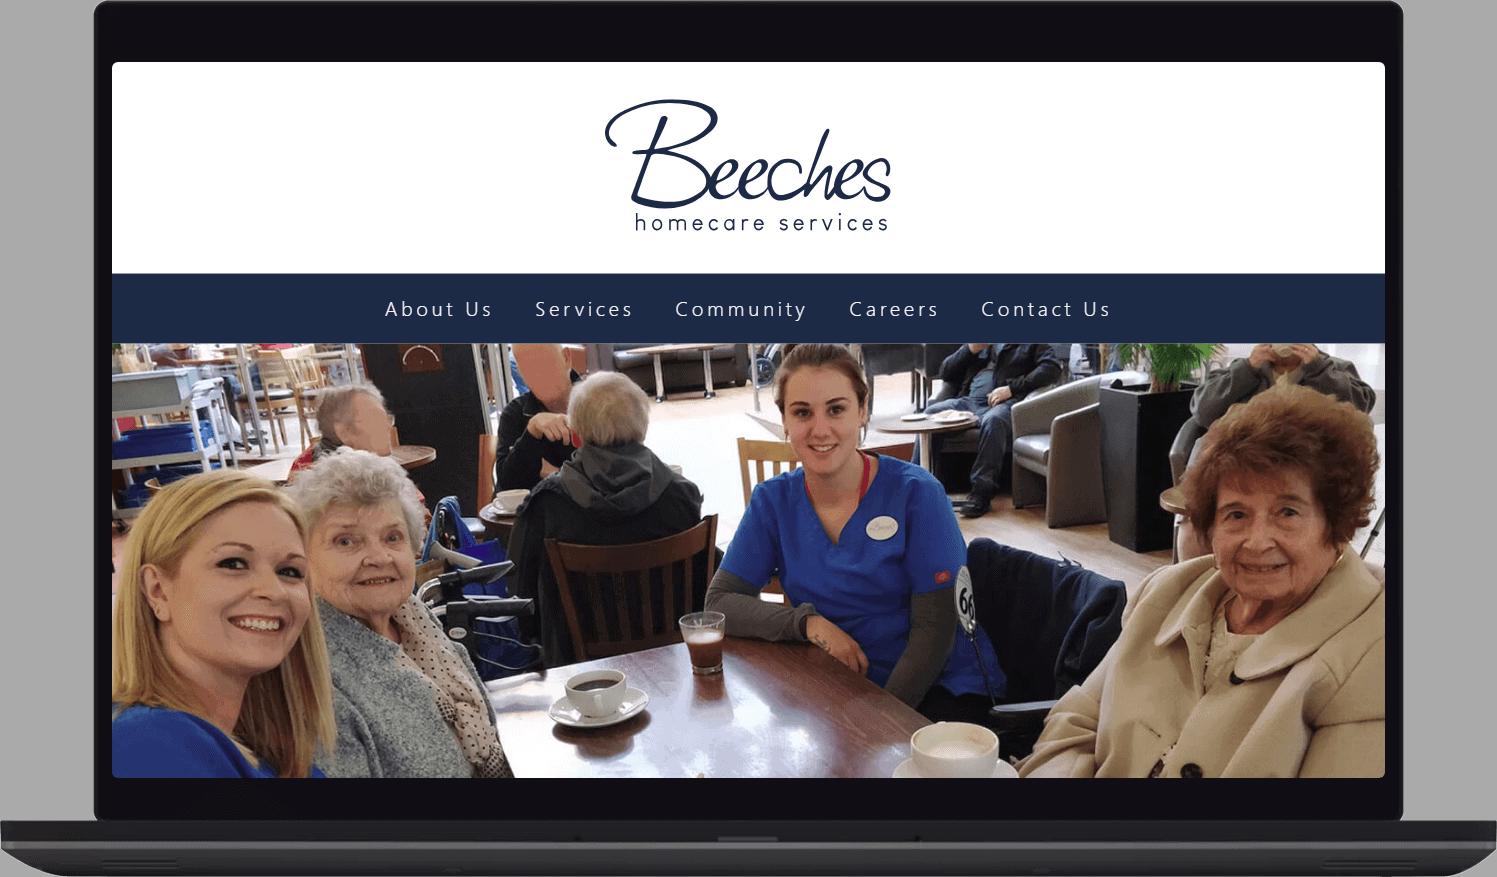 beeches-laptop